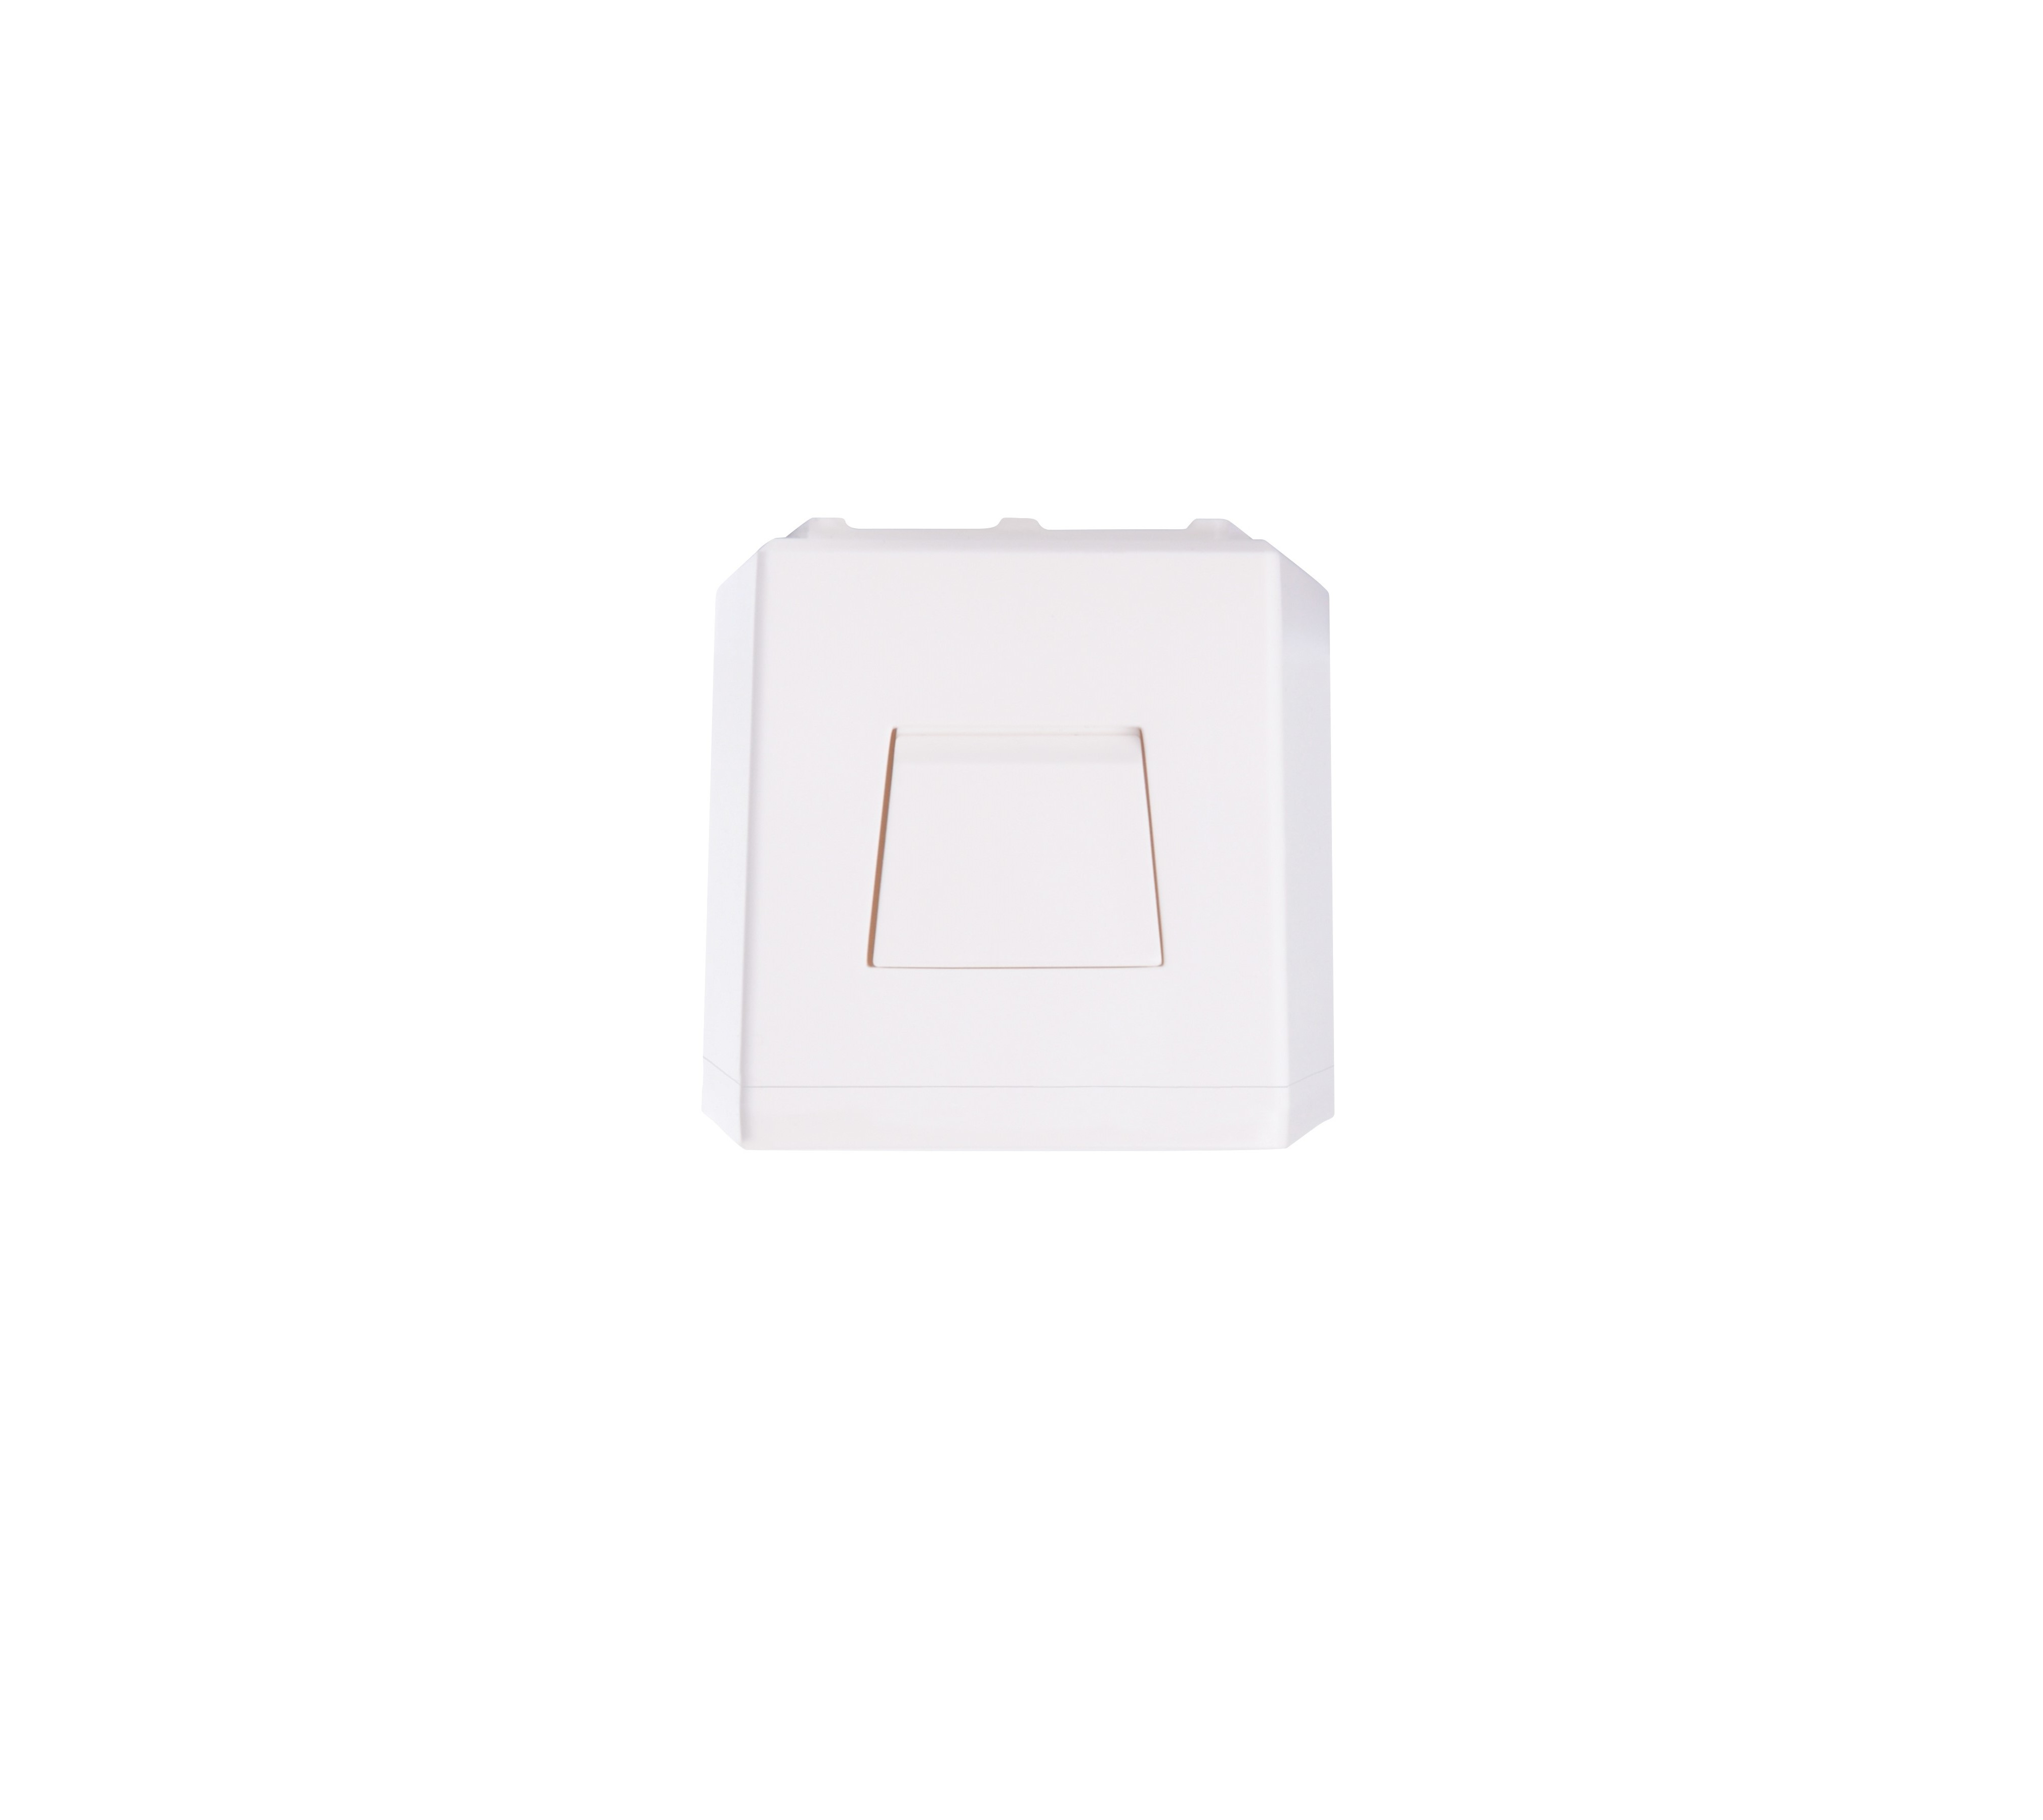 Lampa emergenta led Intelight 94717   3h nementinut test automat1